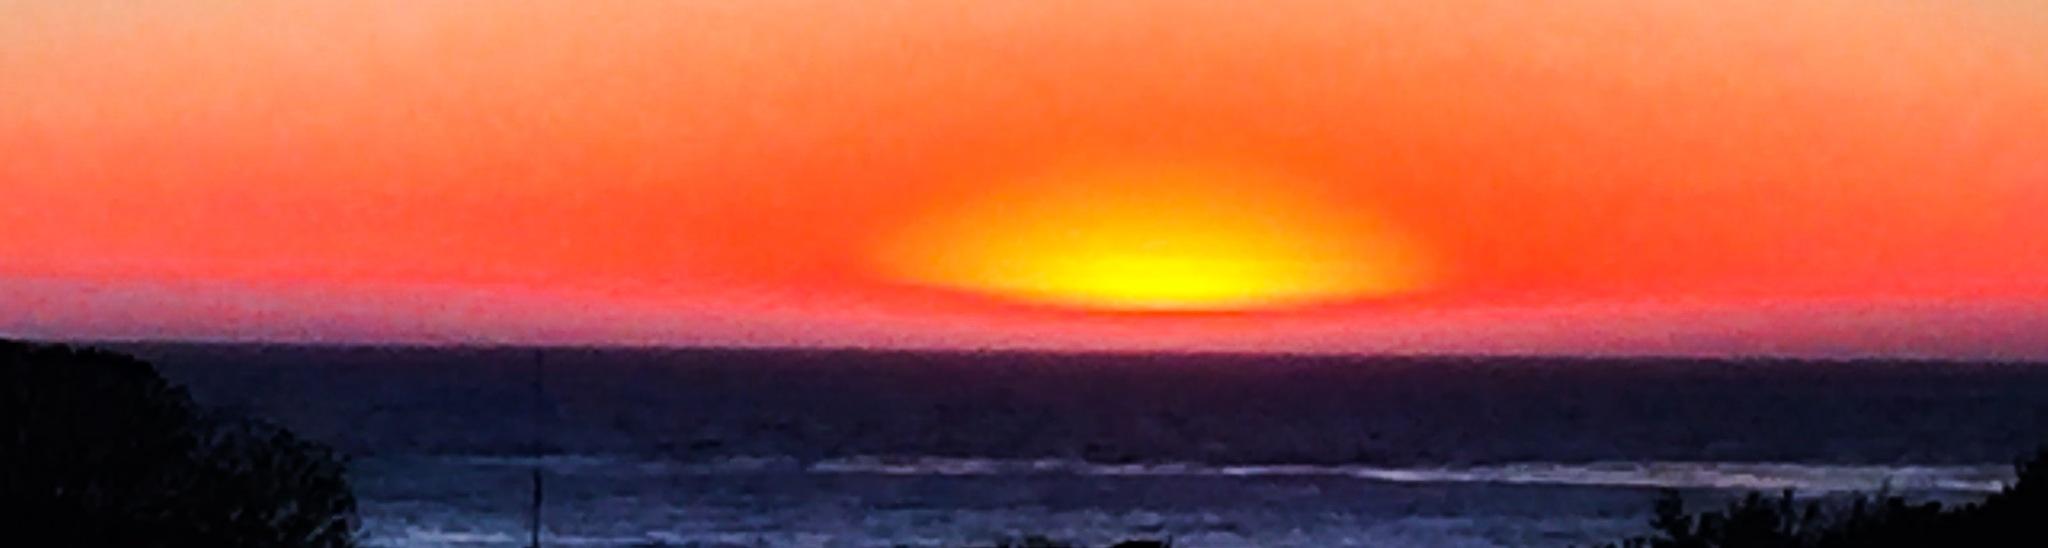 San Simeon Sunset  by 805cameragirl